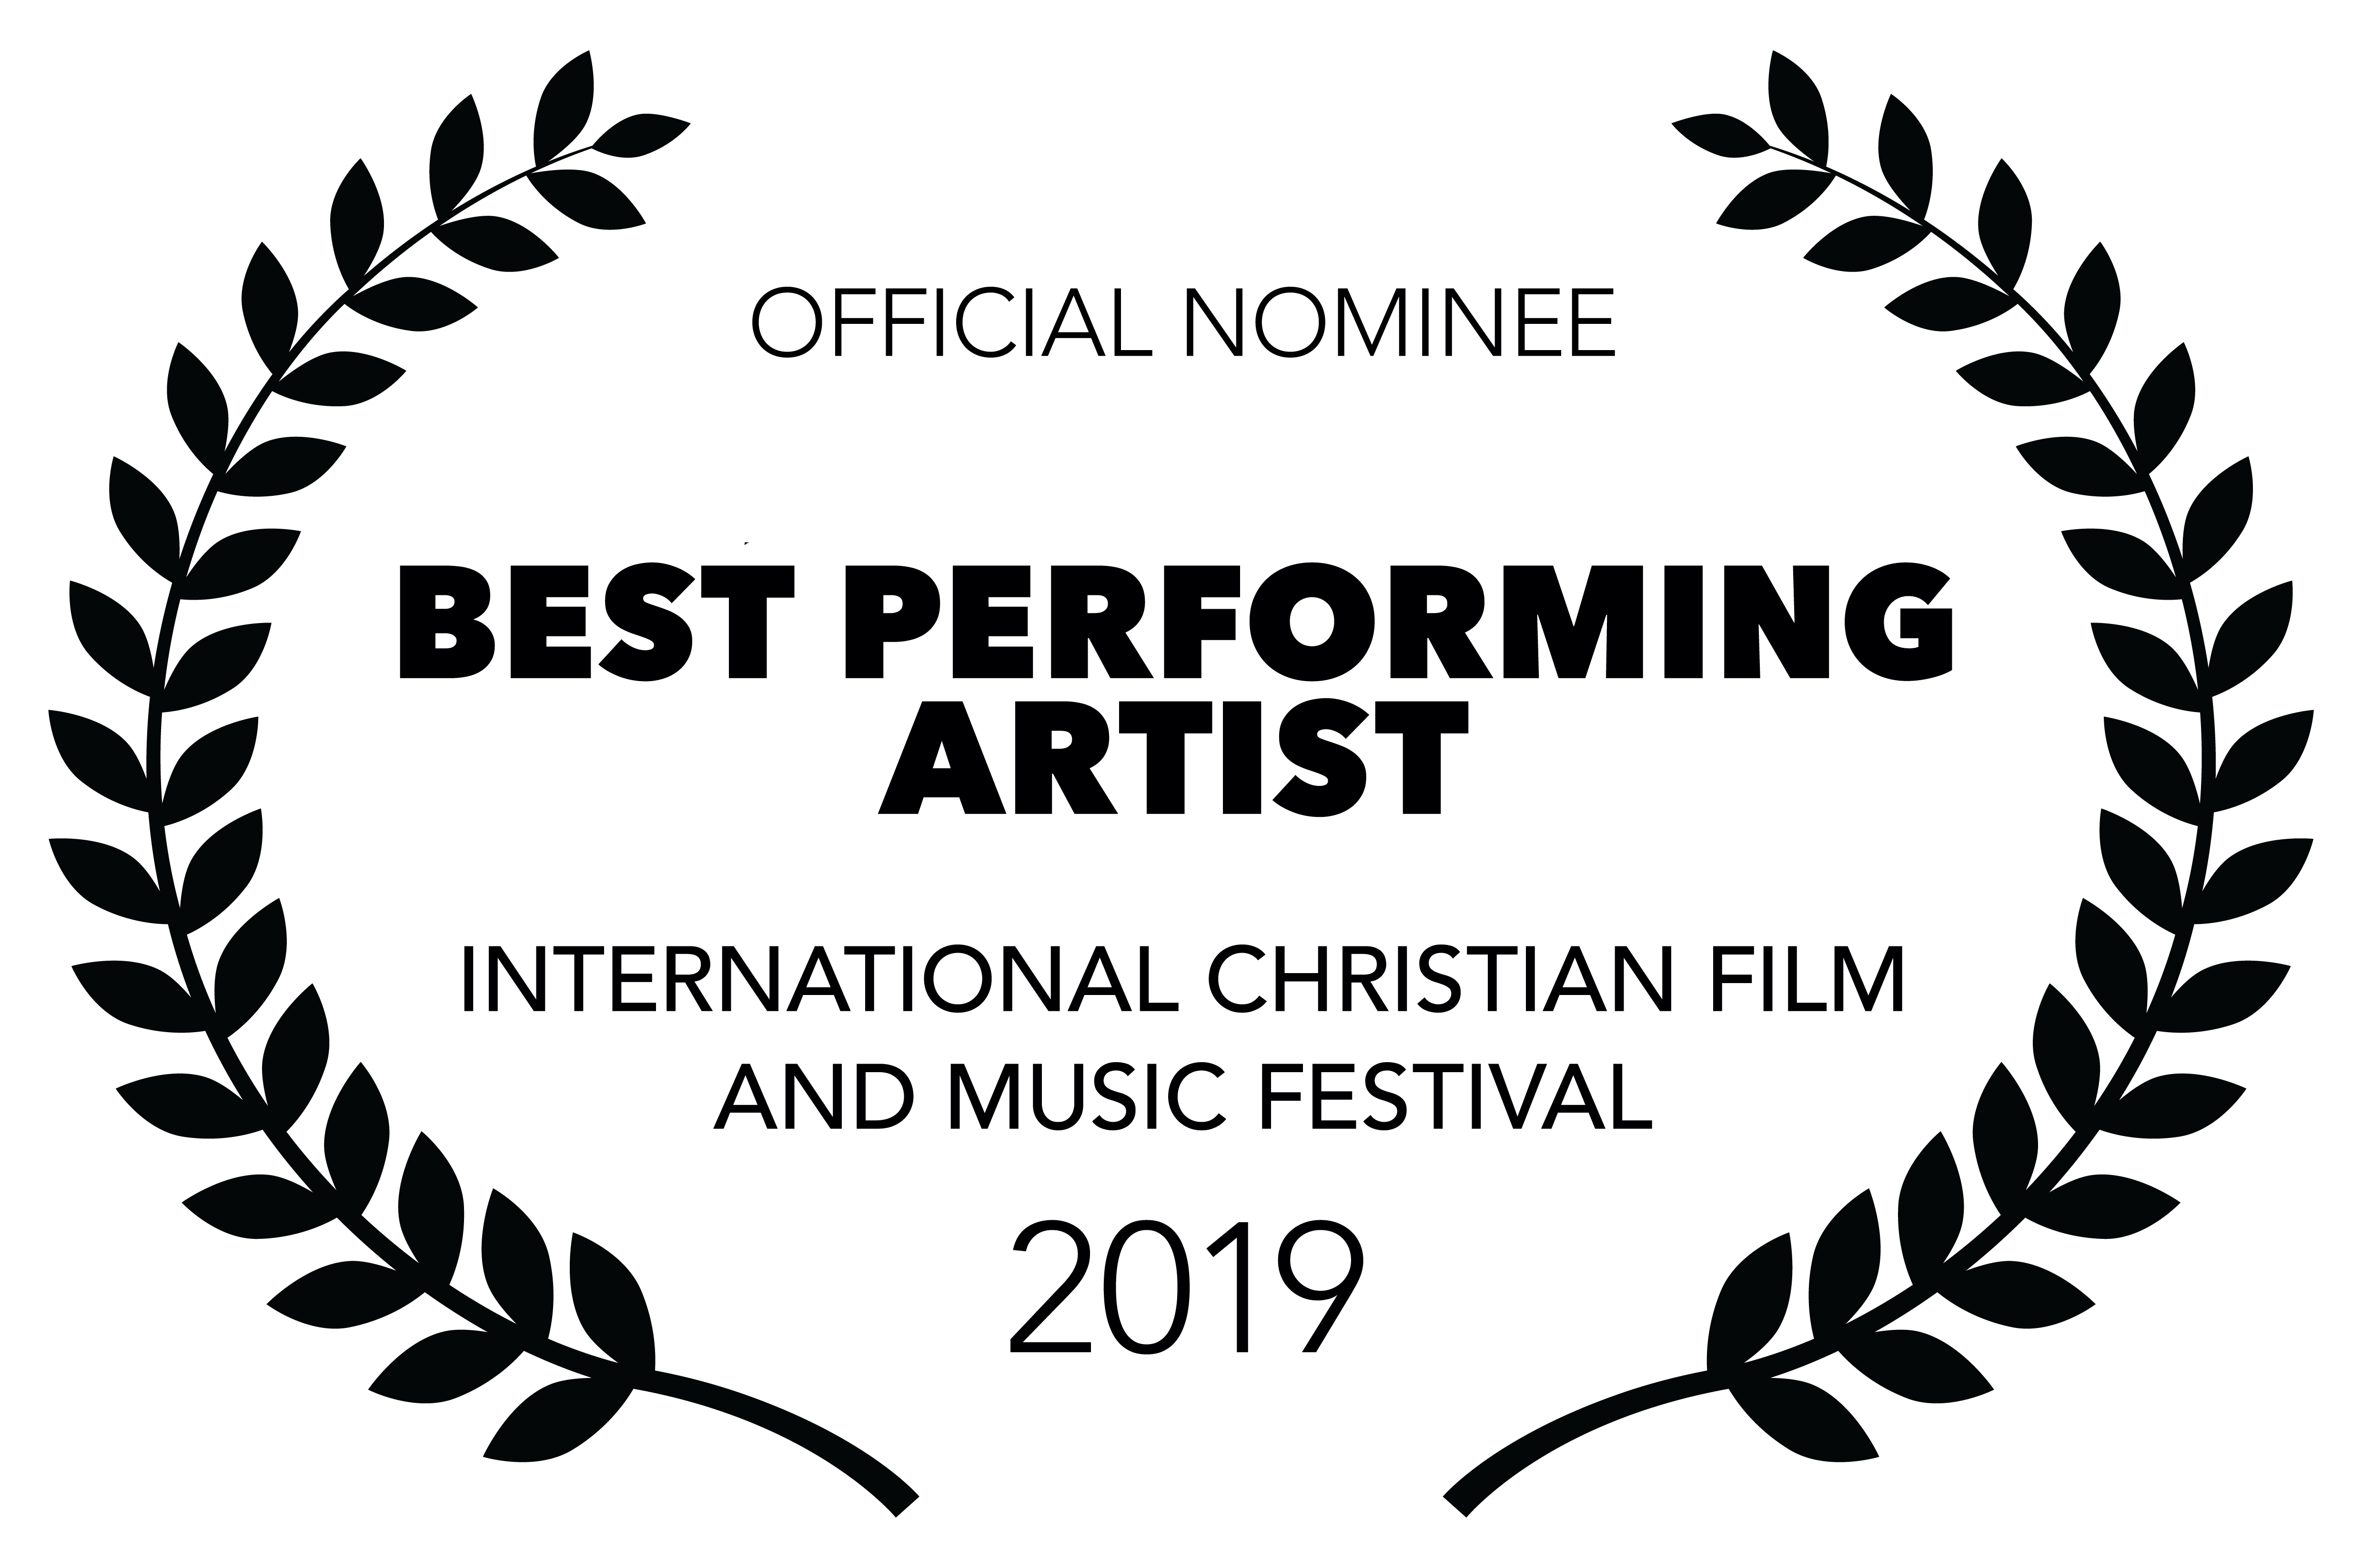 Official Nominee ICFMF